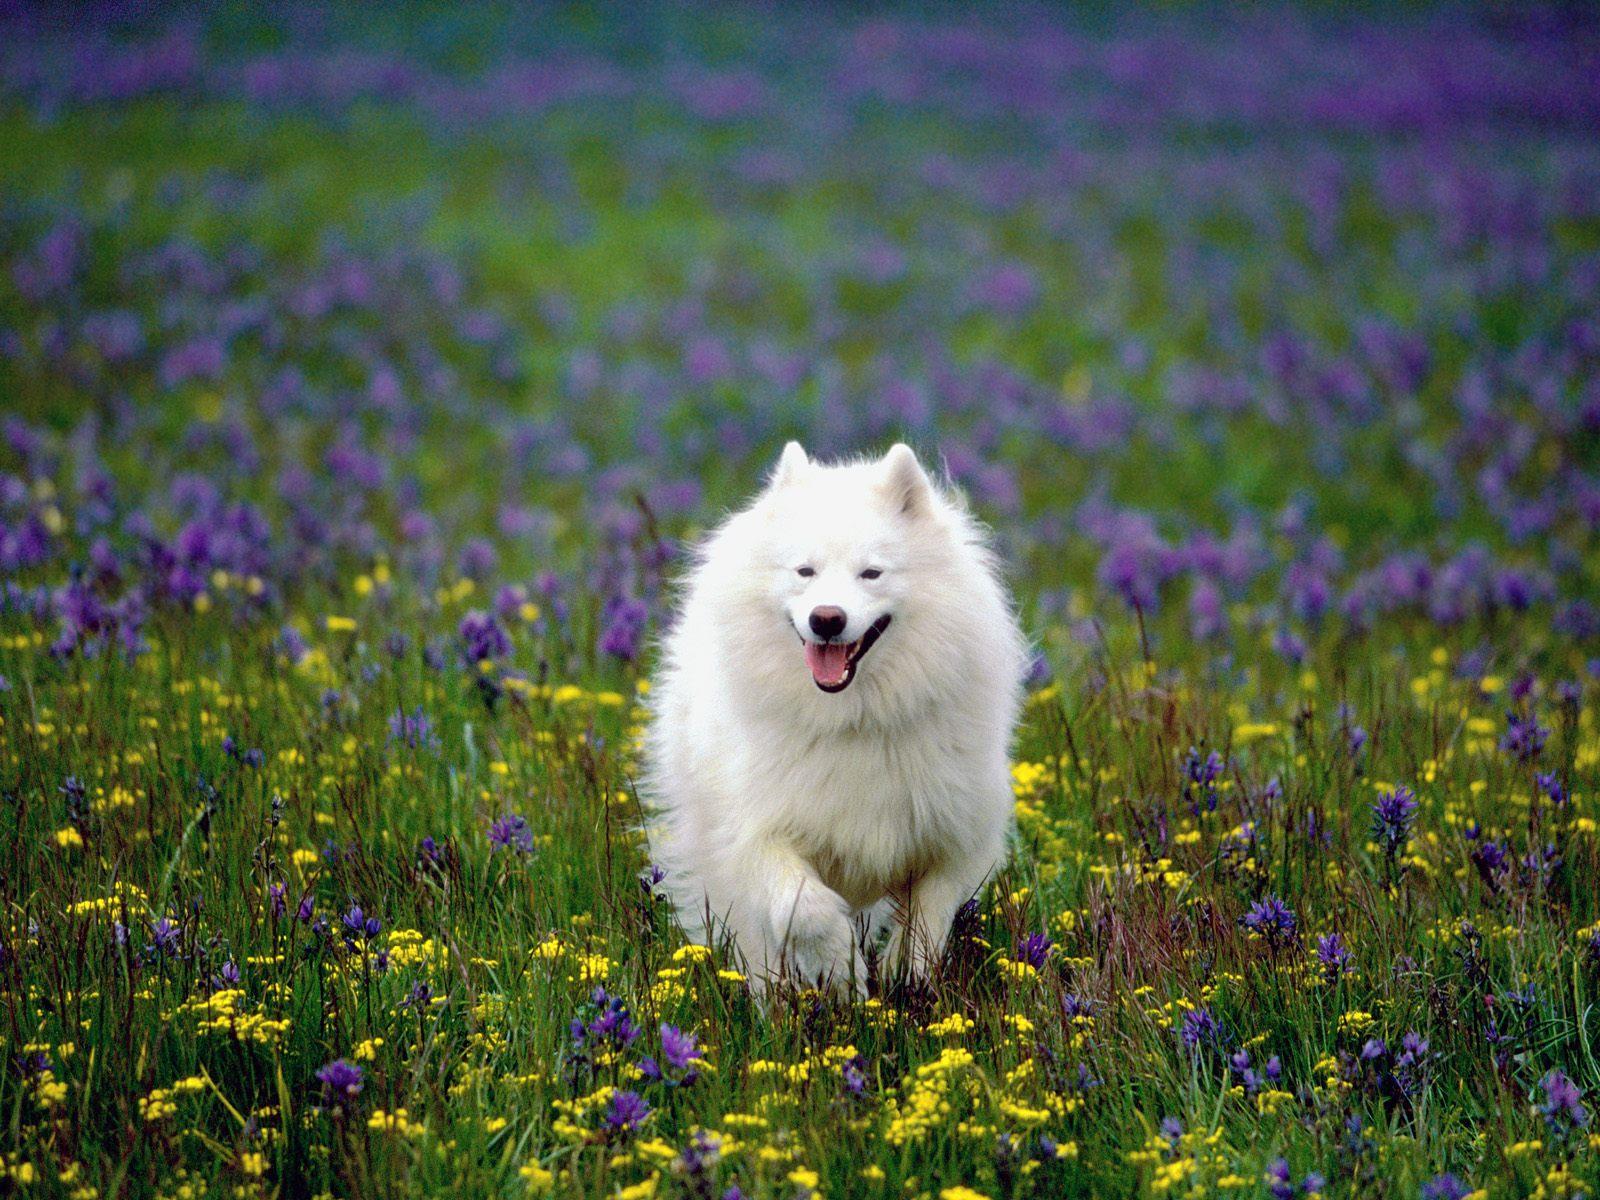 http://1.bp.blogspot.com/-2MFH1RG5Vgc/T7aib0rdalI/AAAAAAAAHUY/lyZkh10AC9w/s1600/beautiful+dog.jpg